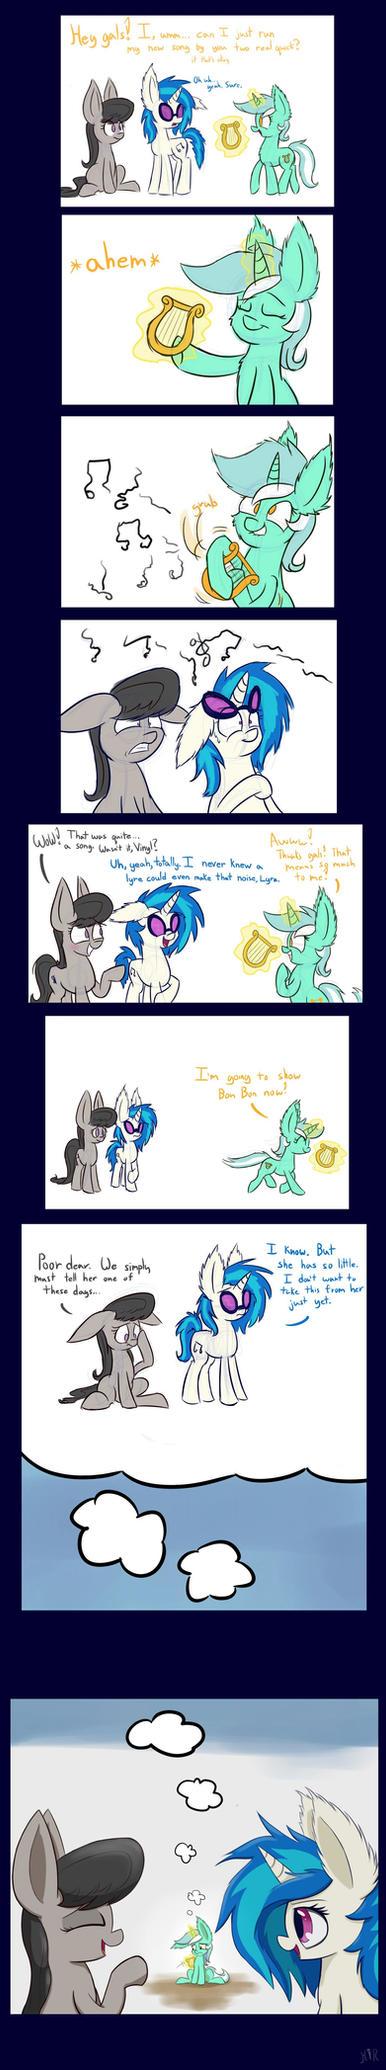 Lyra comic 2 by Heir-of-Rick